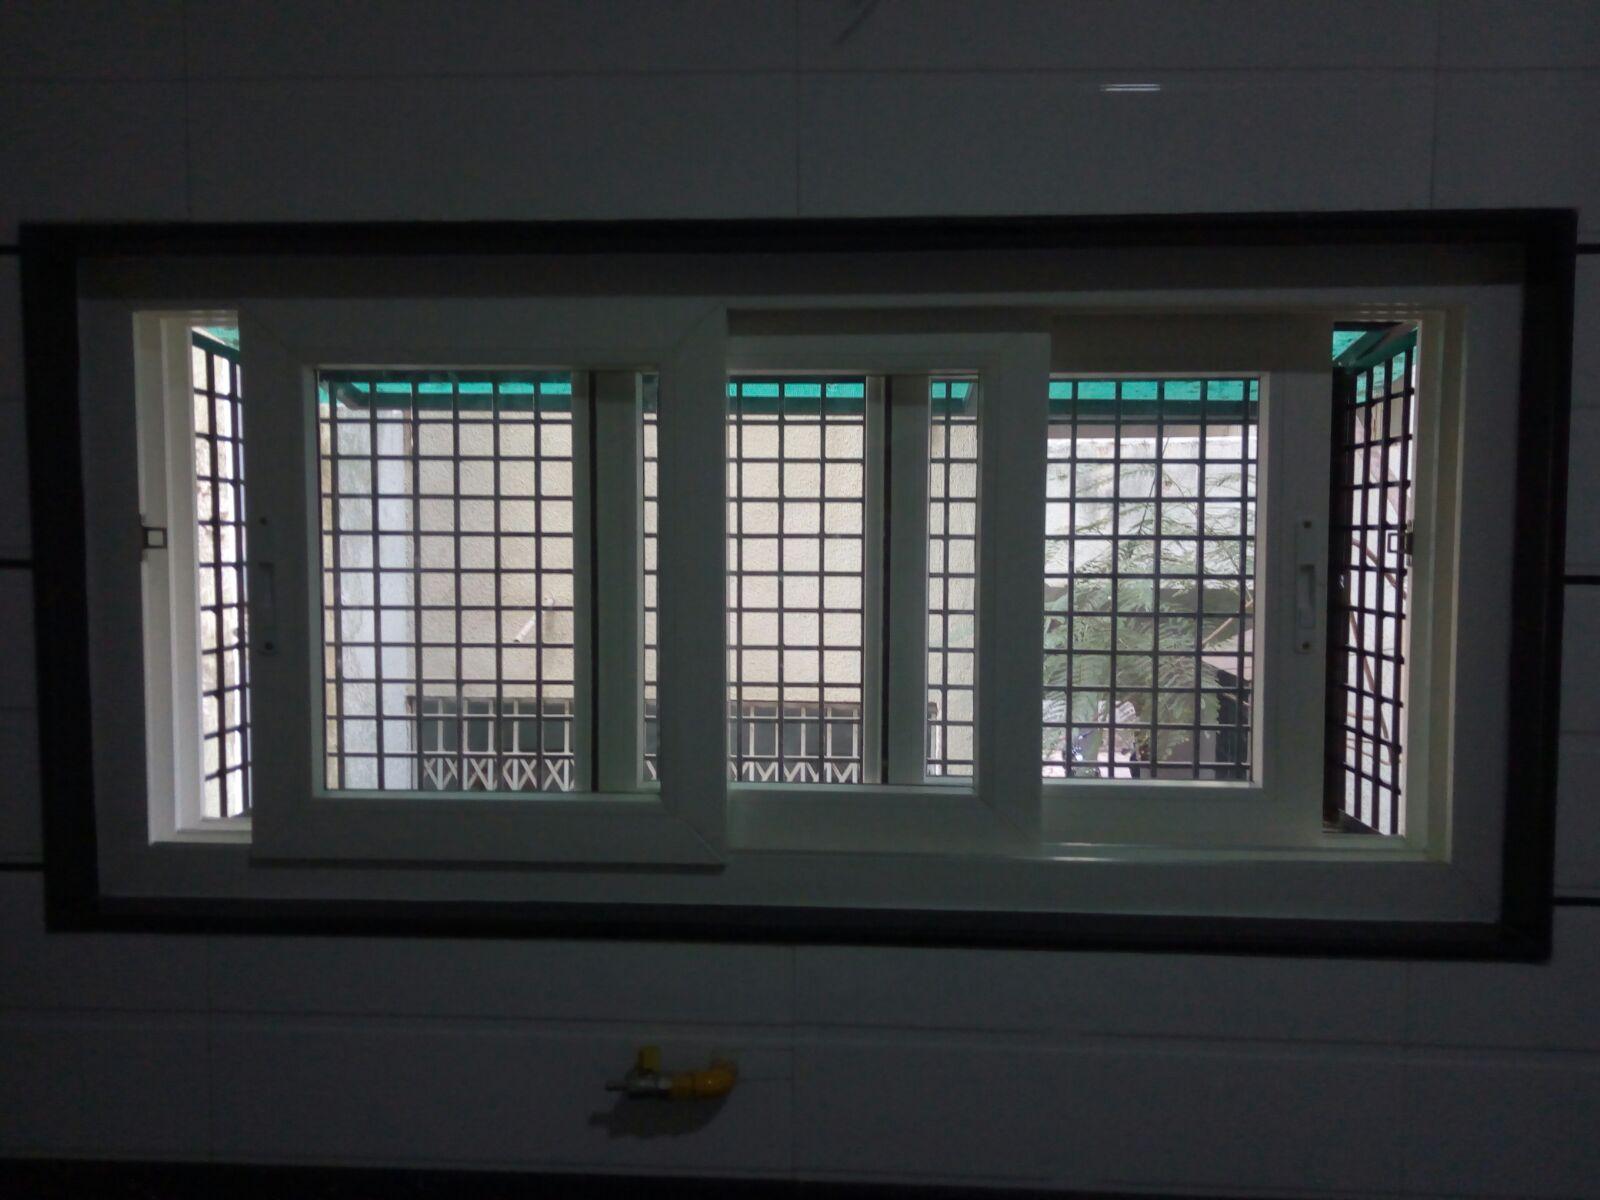 we are suppler of uPVC slide doors uPVC two track sliding windows uPVC three track sliding windows uPVC sliding with wire mesh sash uPVC sliding with mosquito net sash in Gujarat